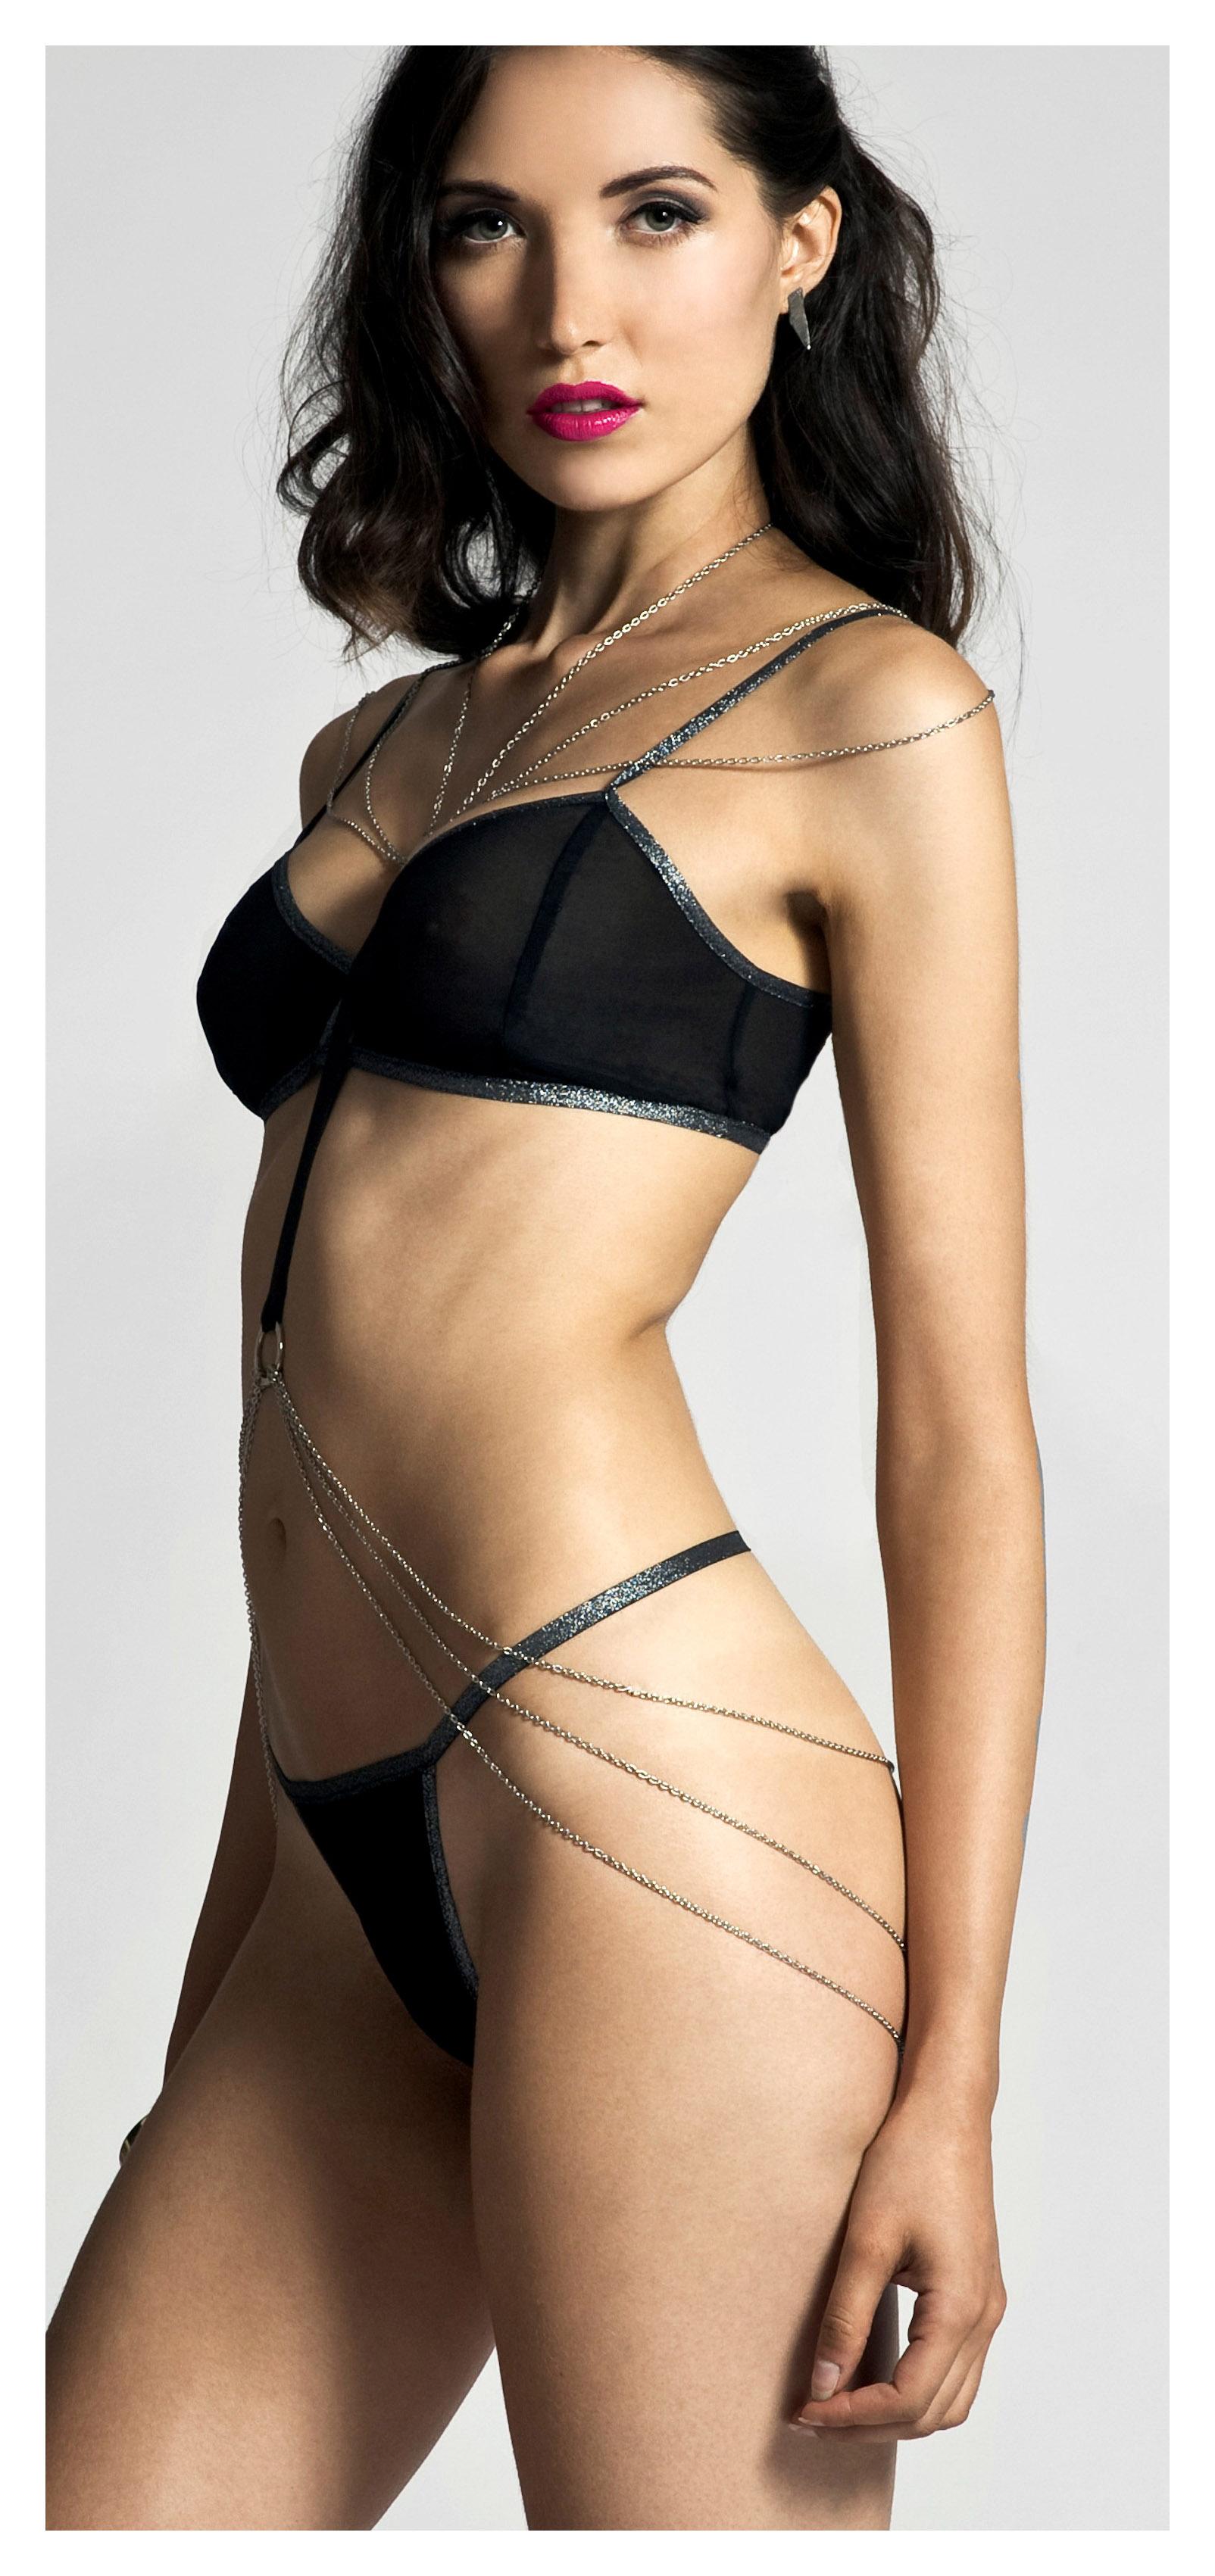 web_of_seduction_body_chain2_b.jpg